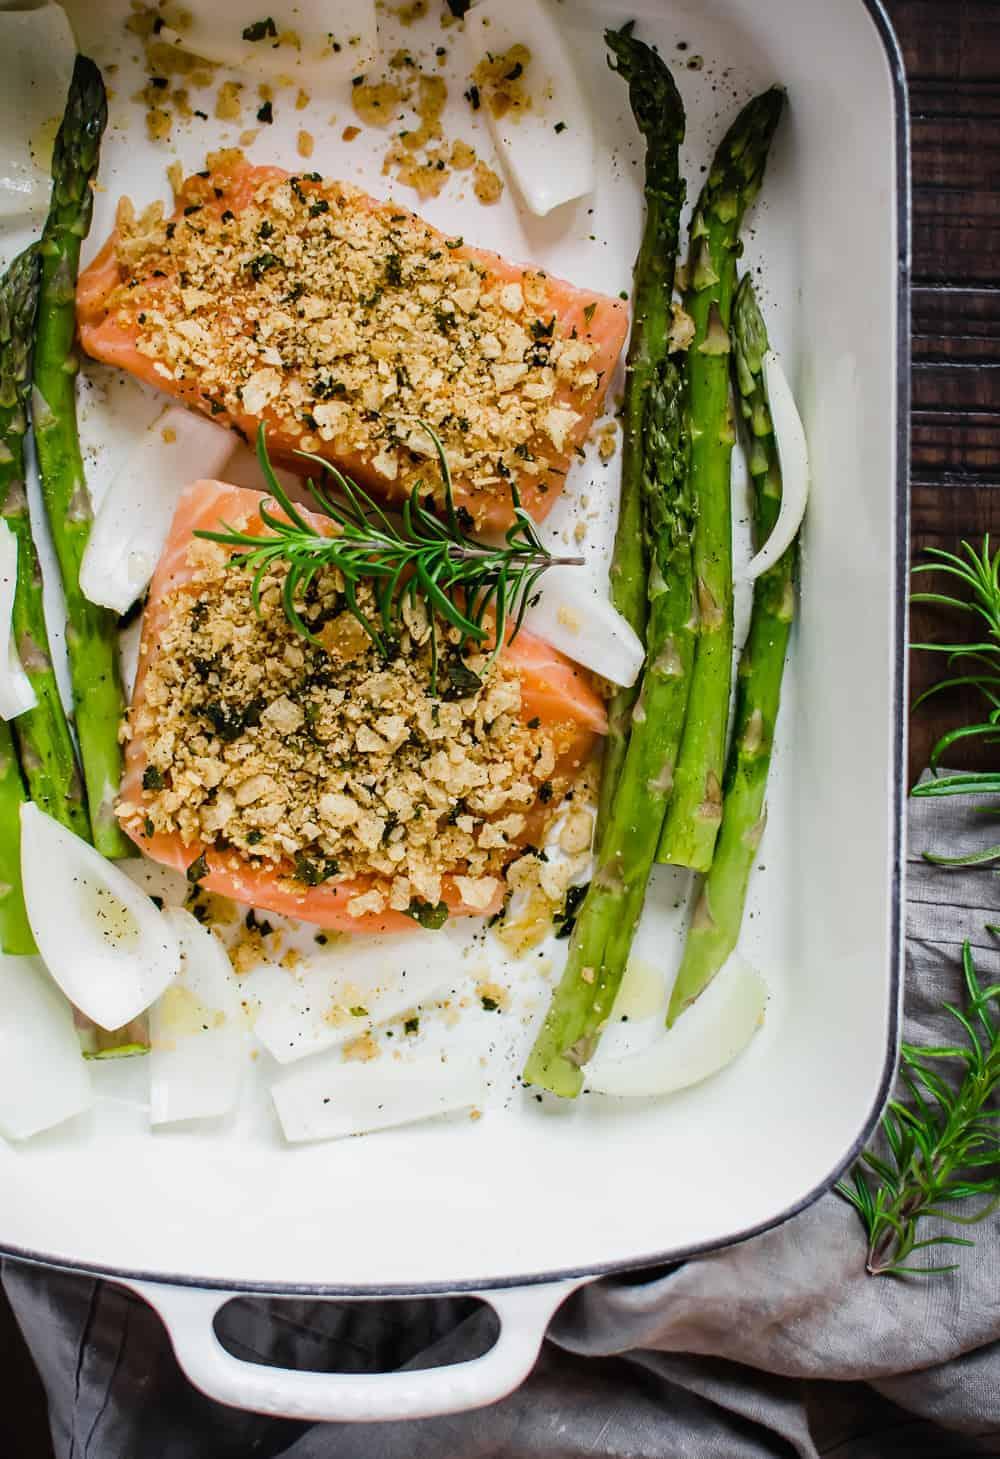 Best-Baked-Salmon-Recipe-Herb-Crust-Gluten-Free-4